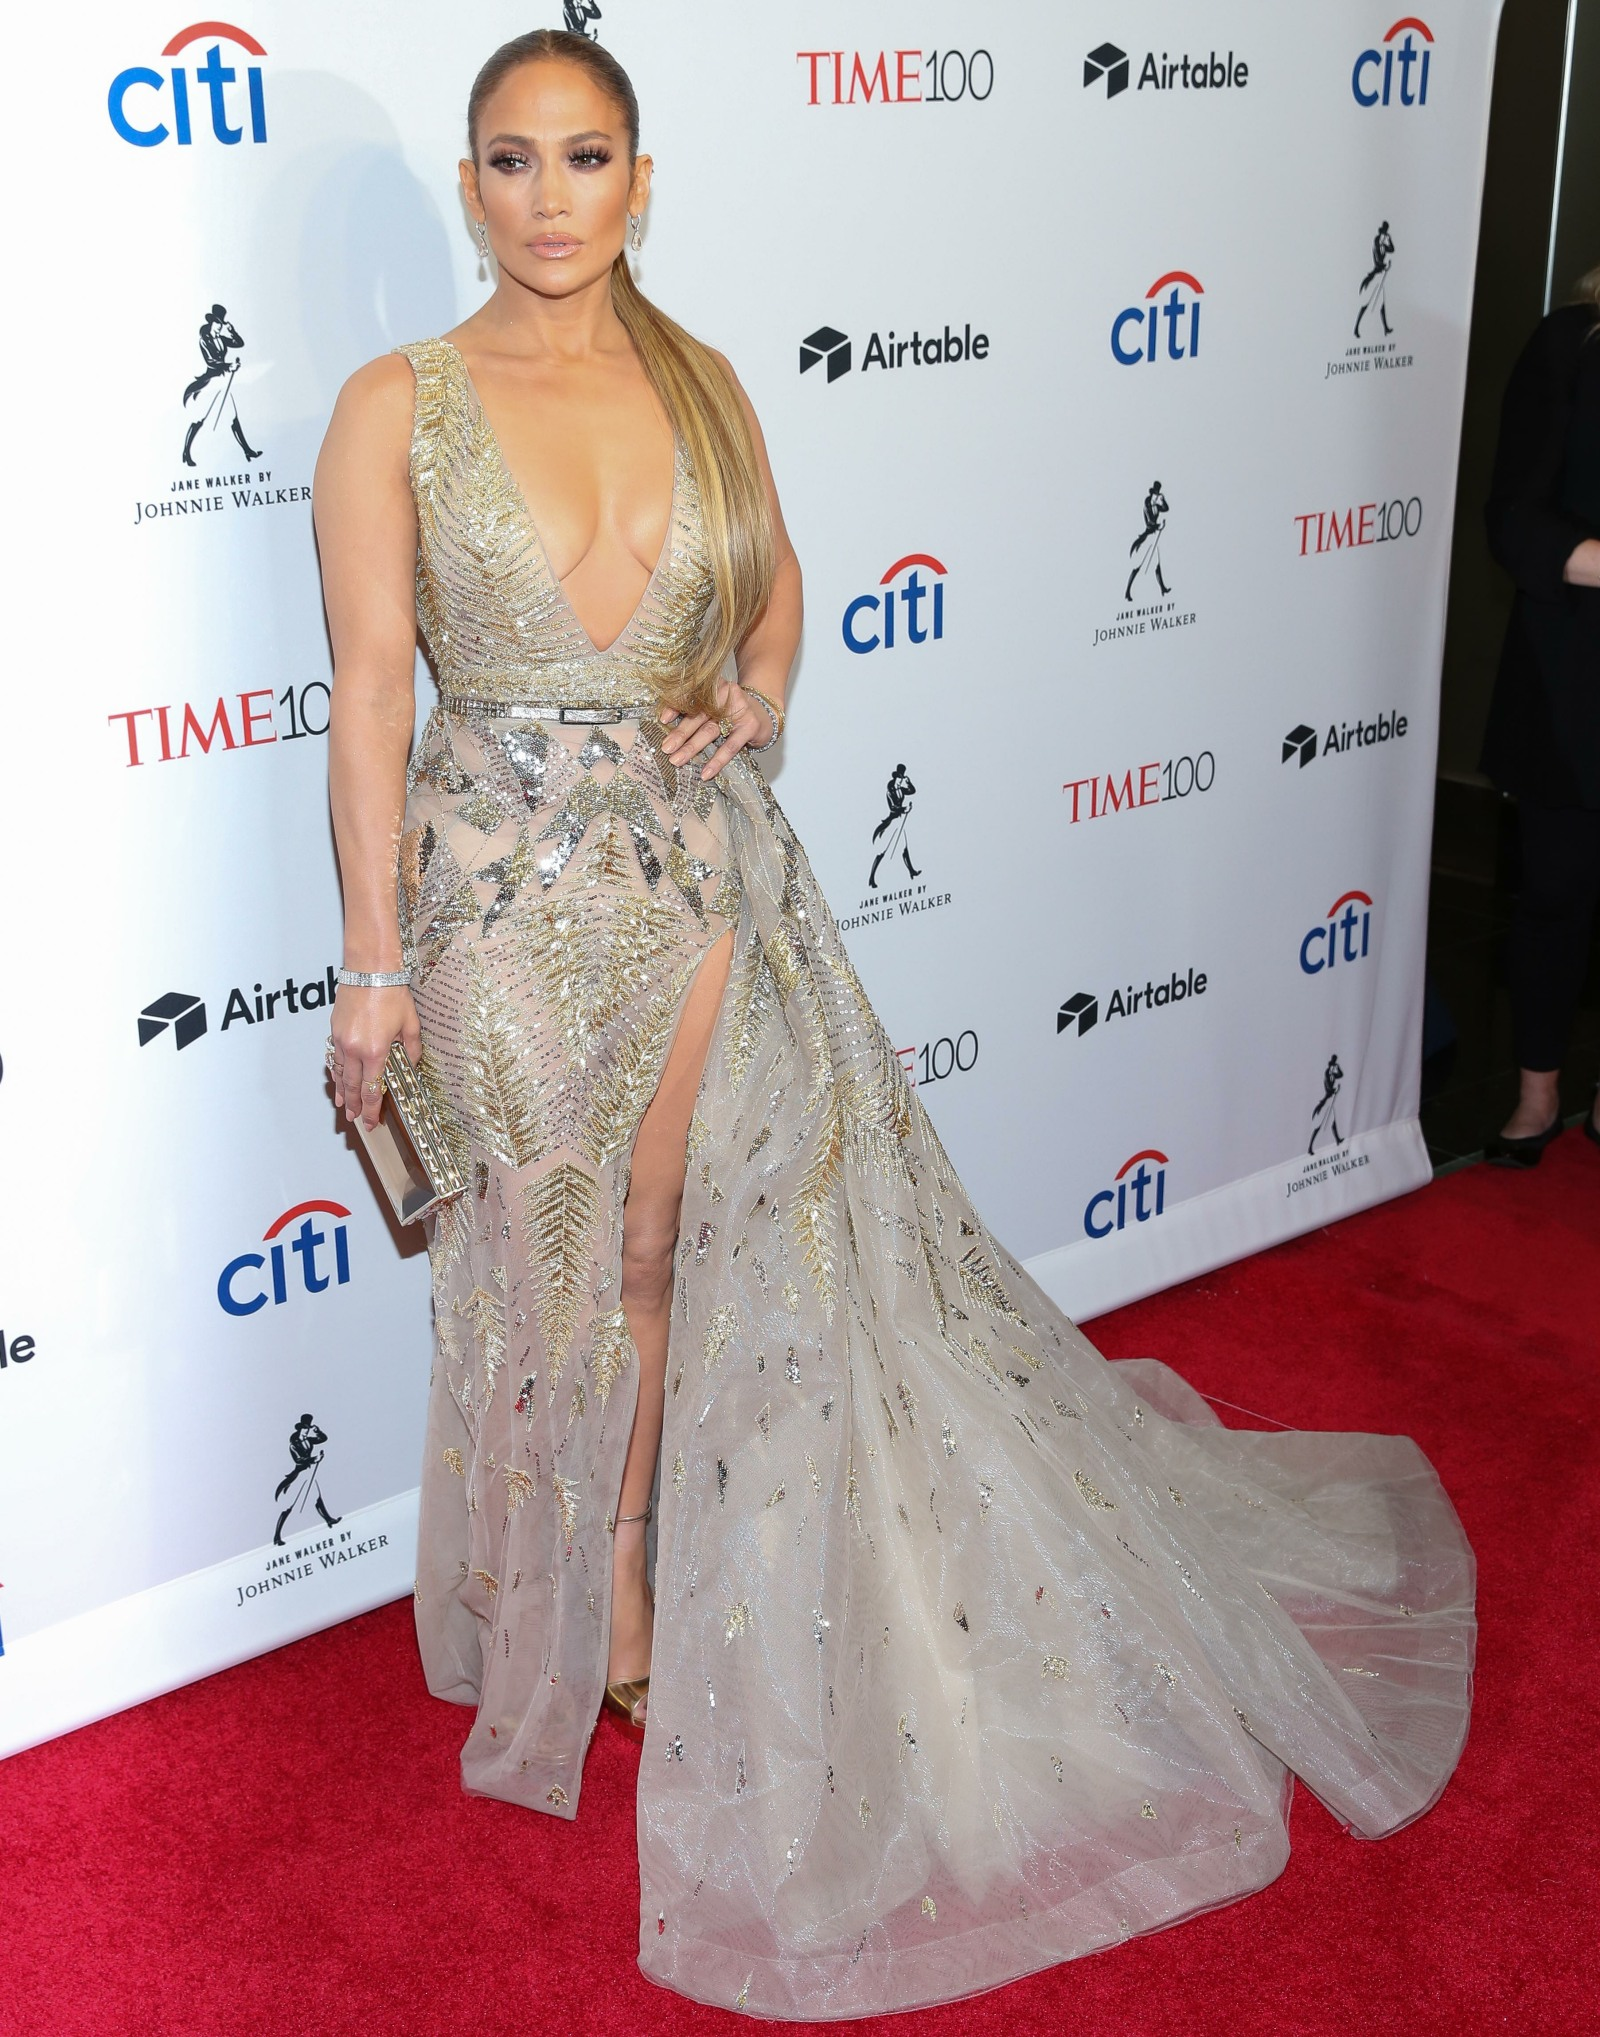 time 100 gala New york